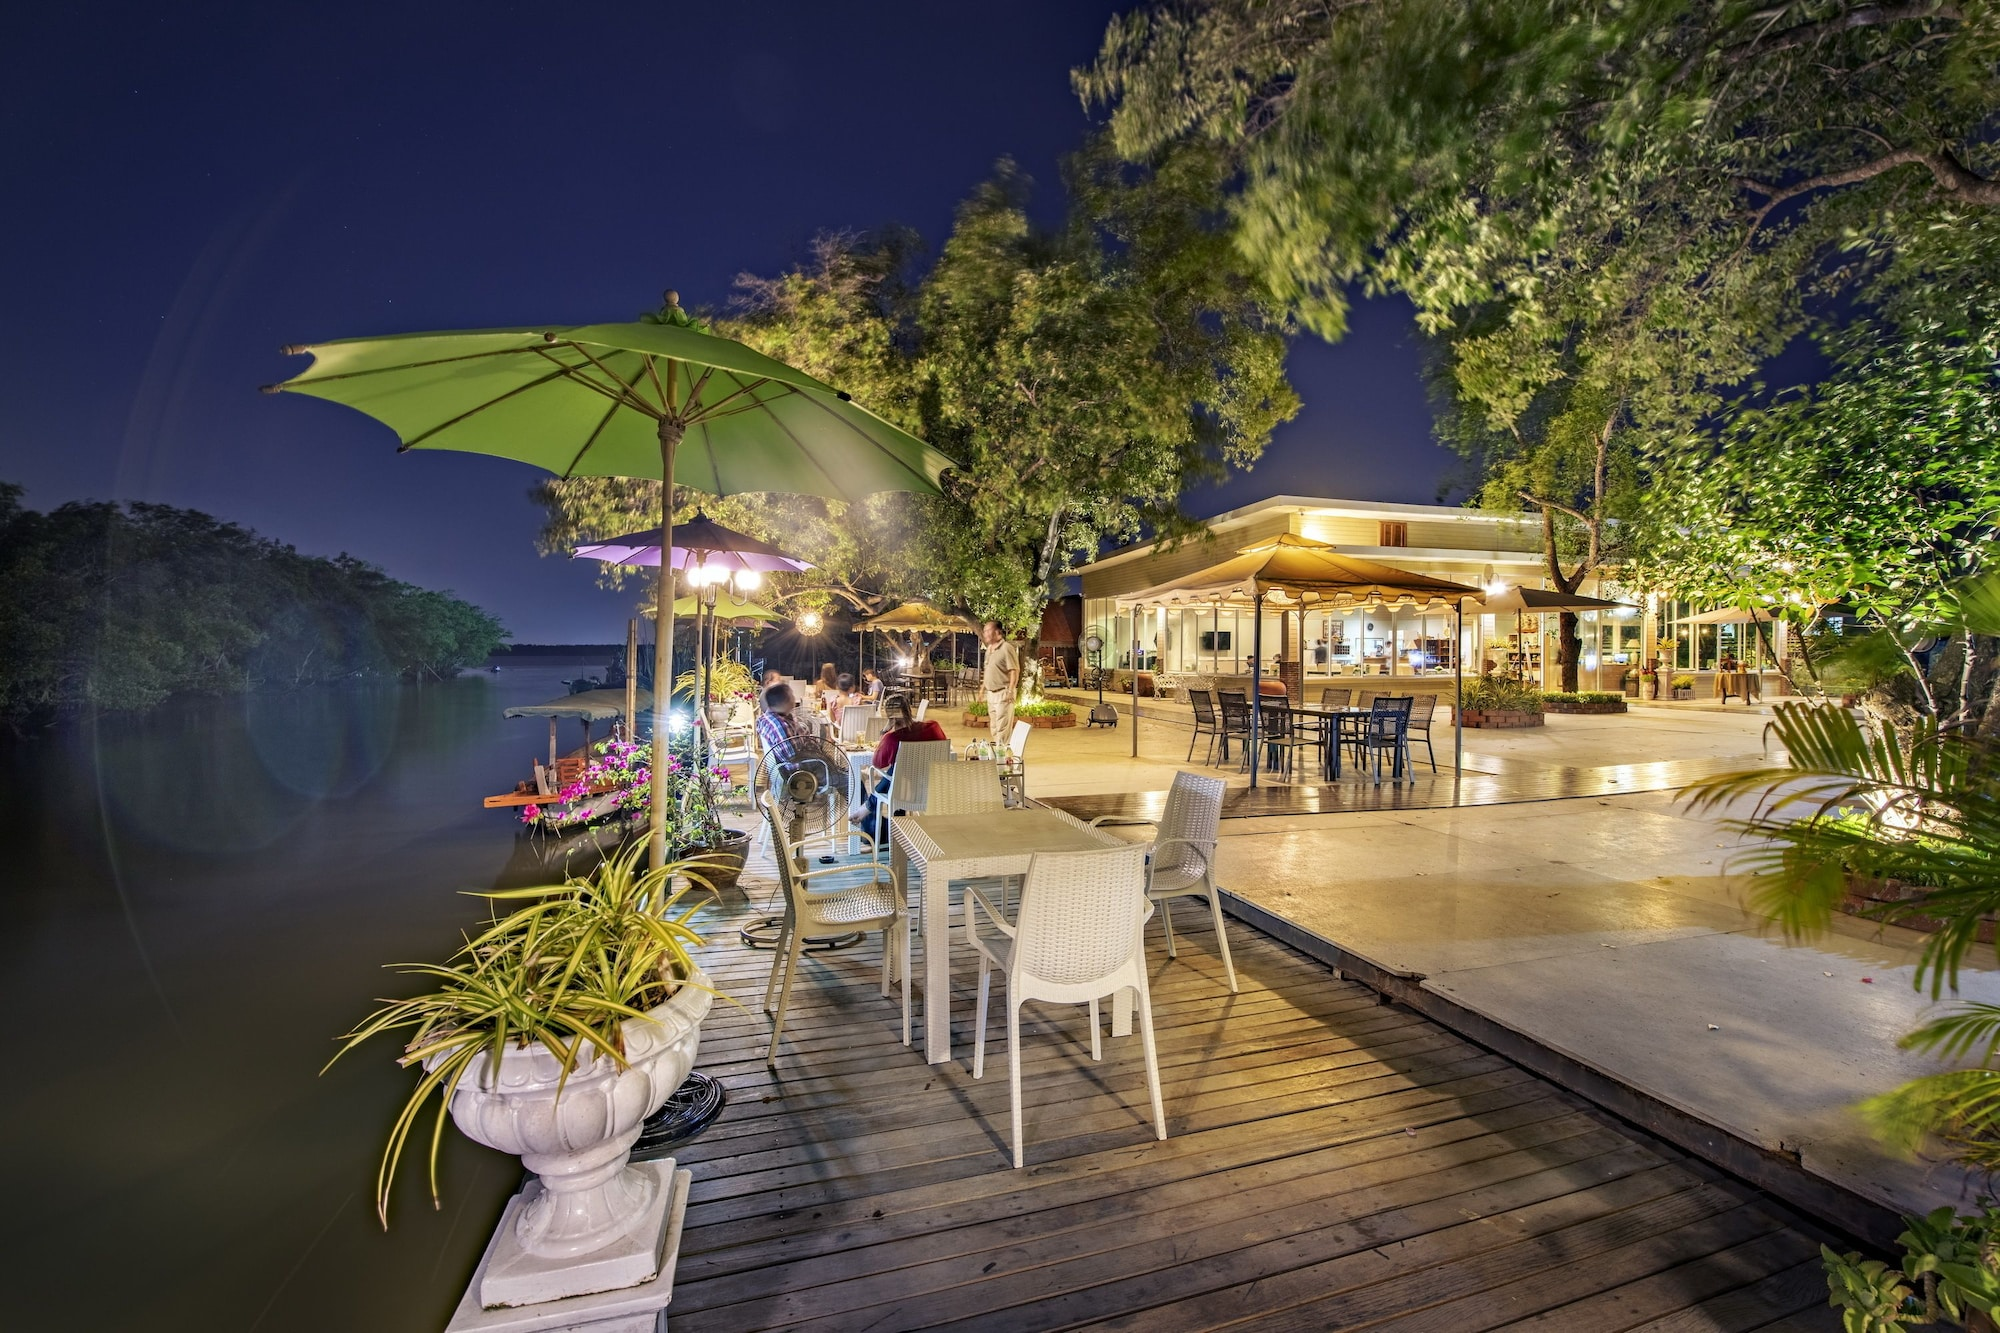 Ratathara Resort, Muang Chon Buri